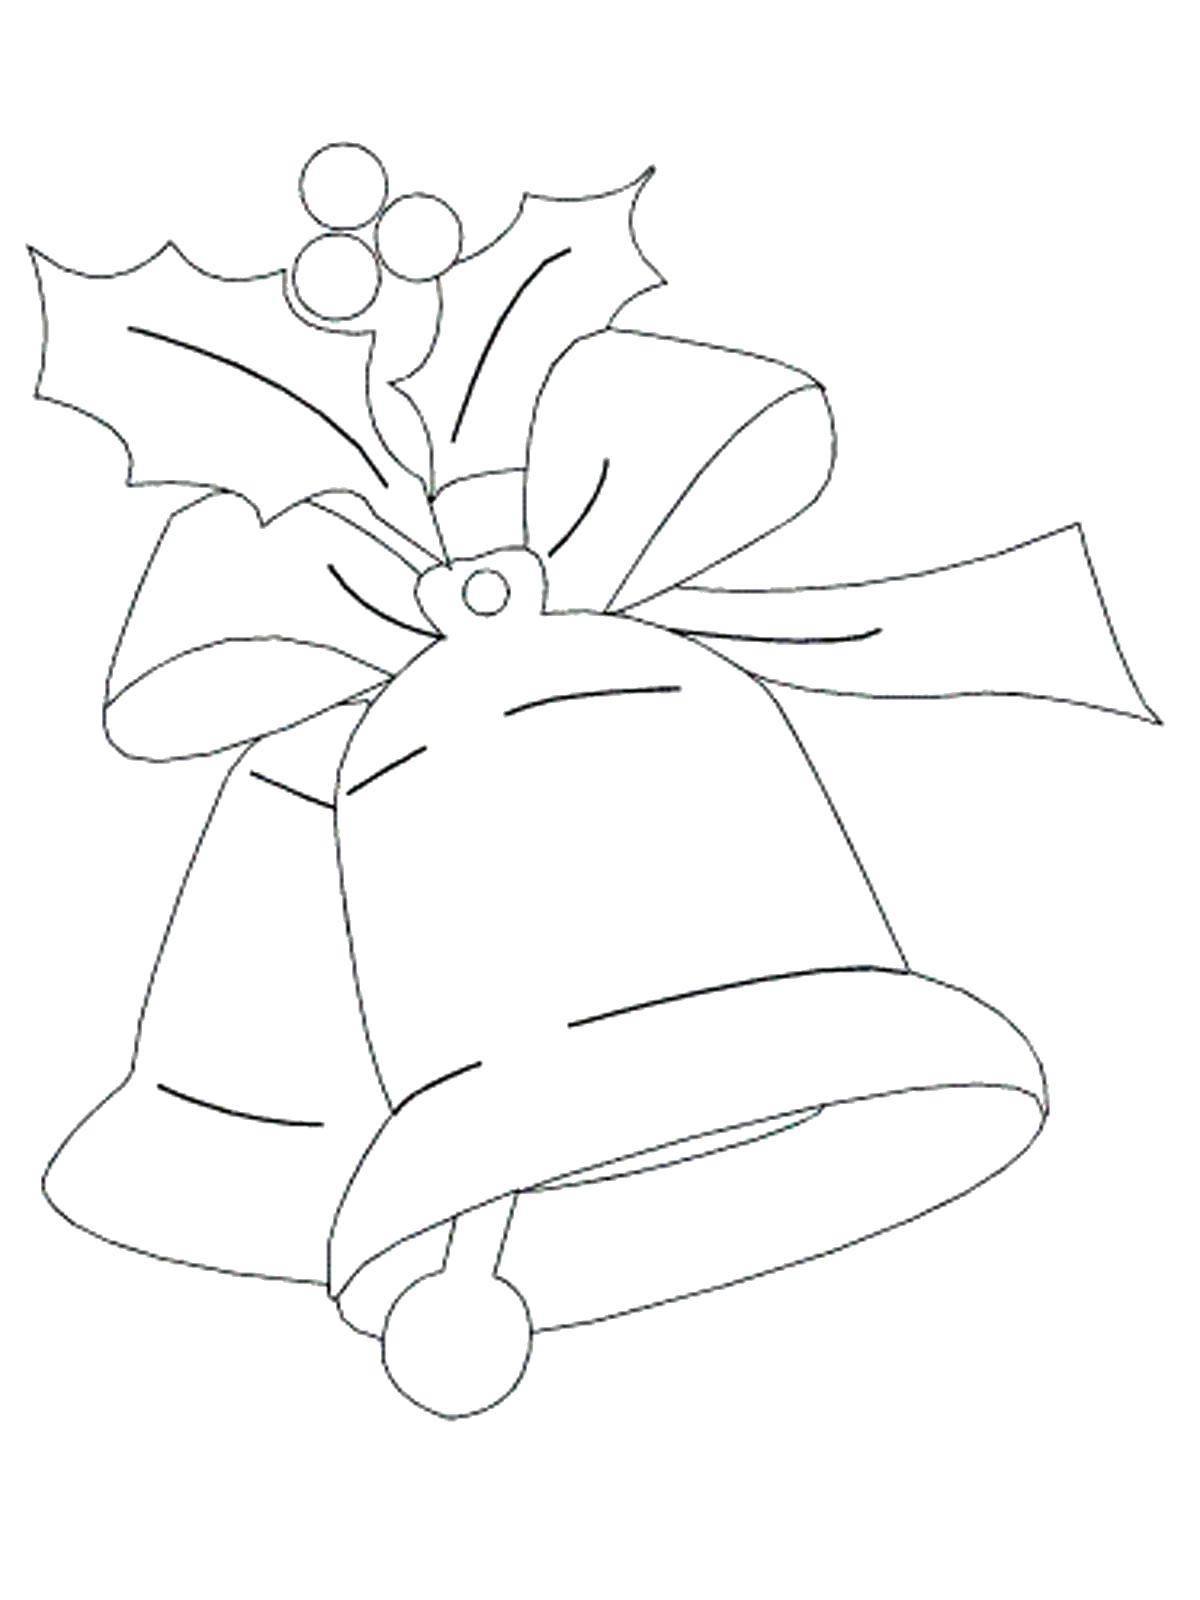 Новогодние рисунки первоклашки